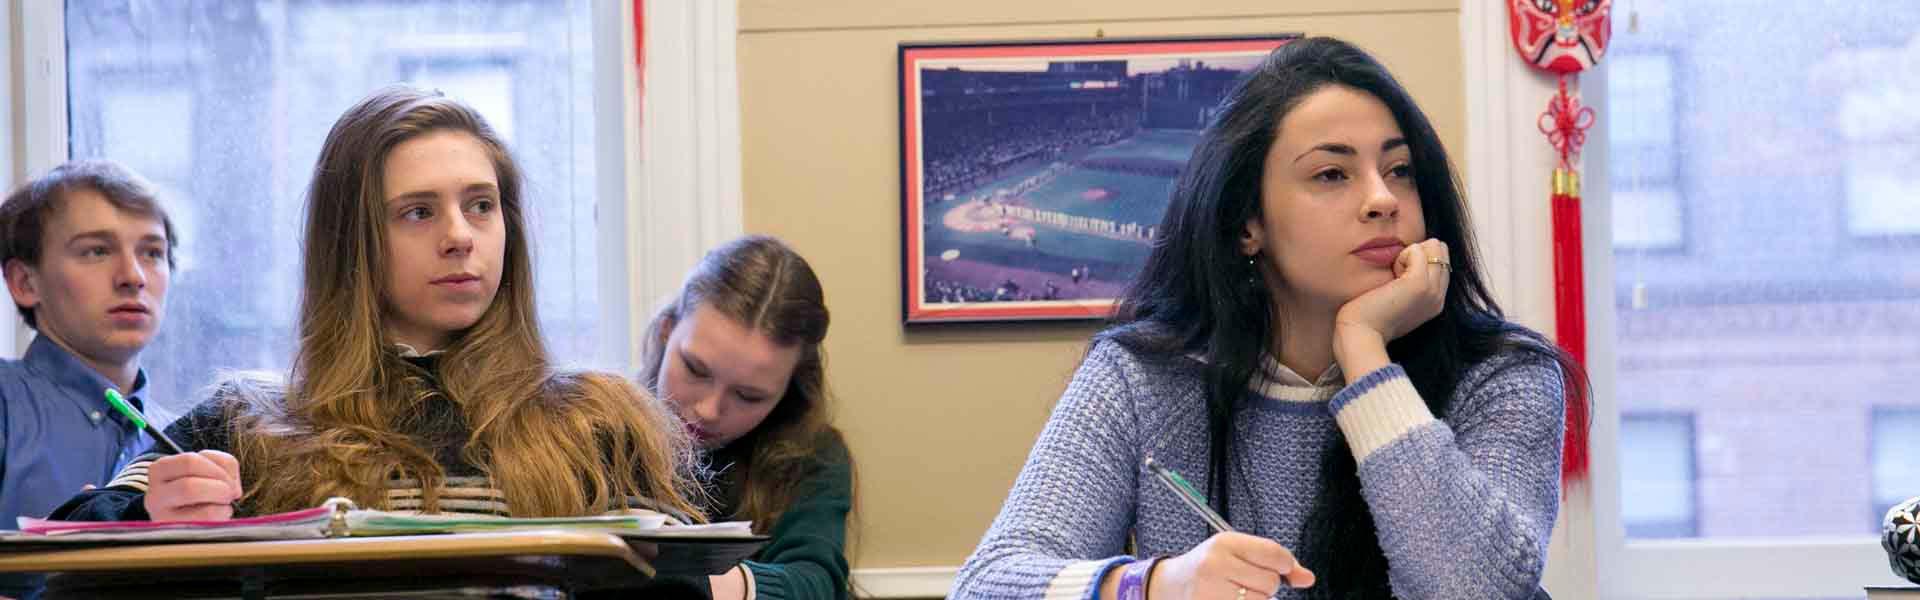 Newman-Highschool-MA-Classroom-Main-BAnner